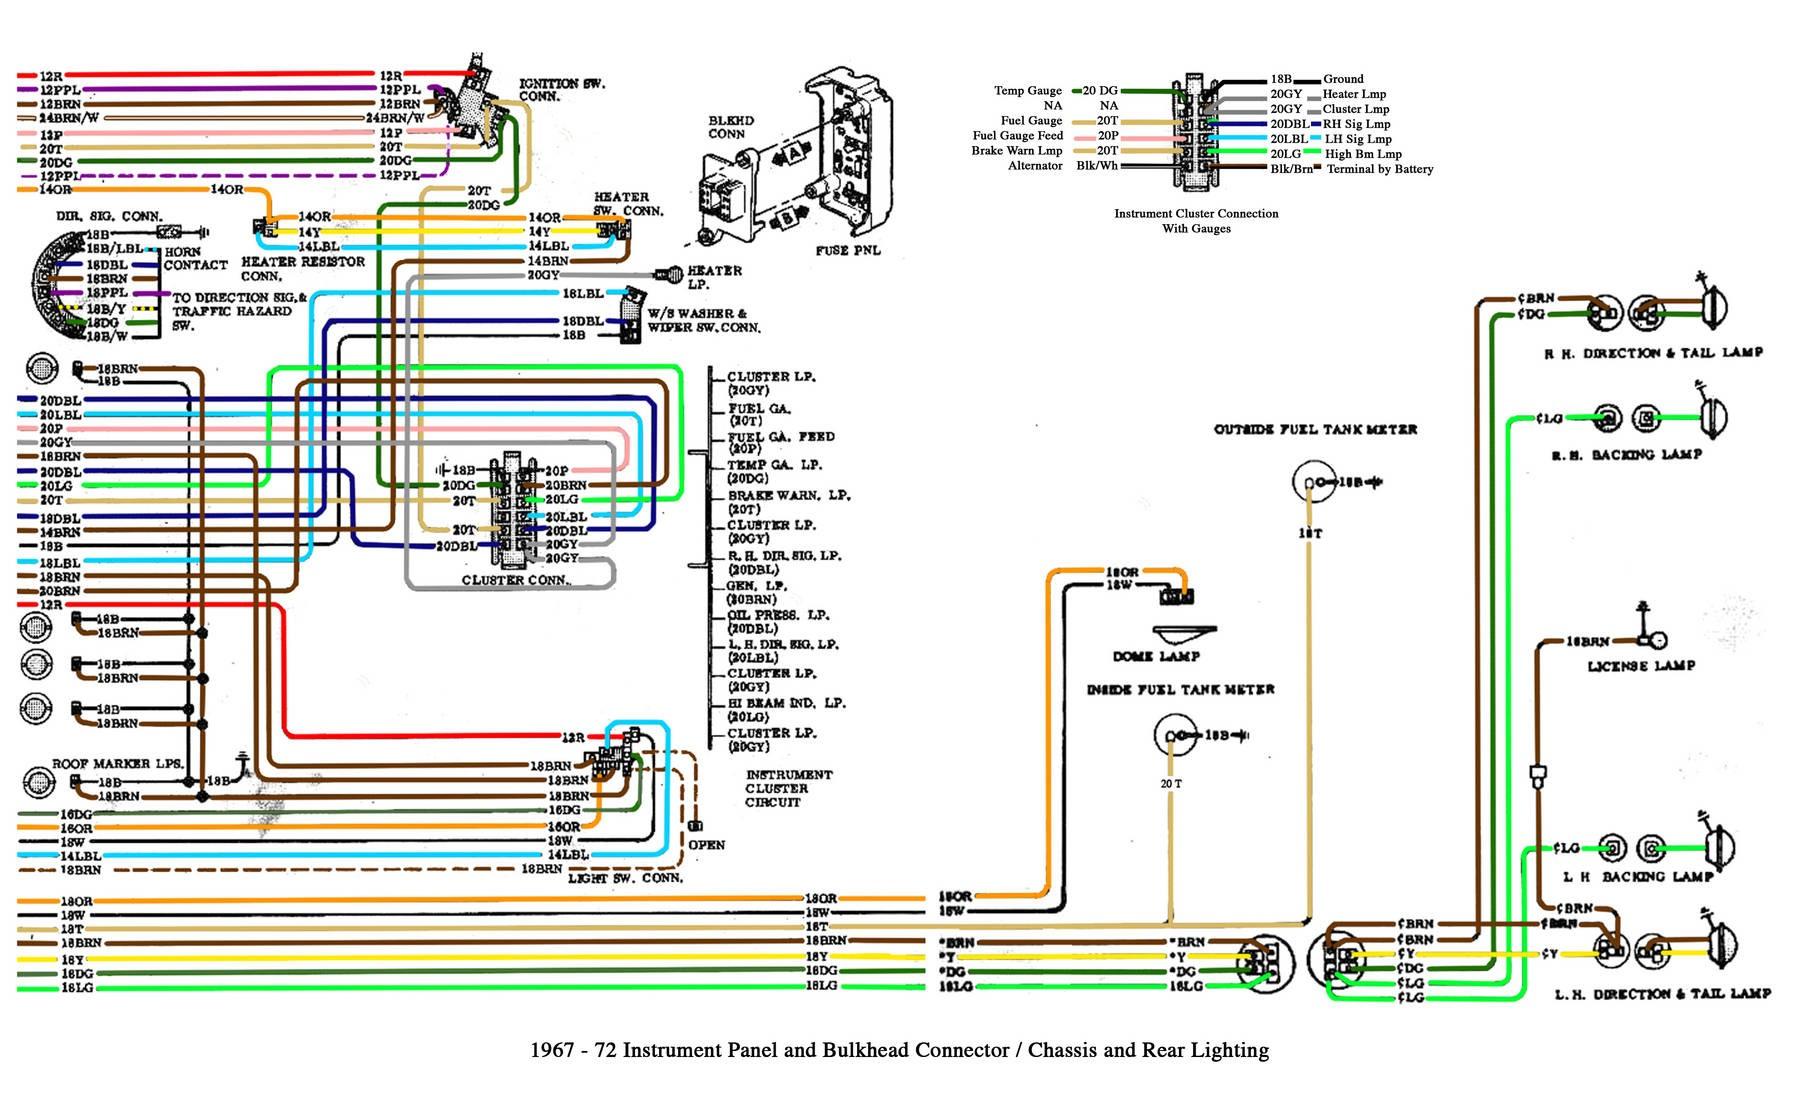 1988 Ford F 150 Fuel Pump Wiring Diagram 1995 F150 Radio Panel 1997 More